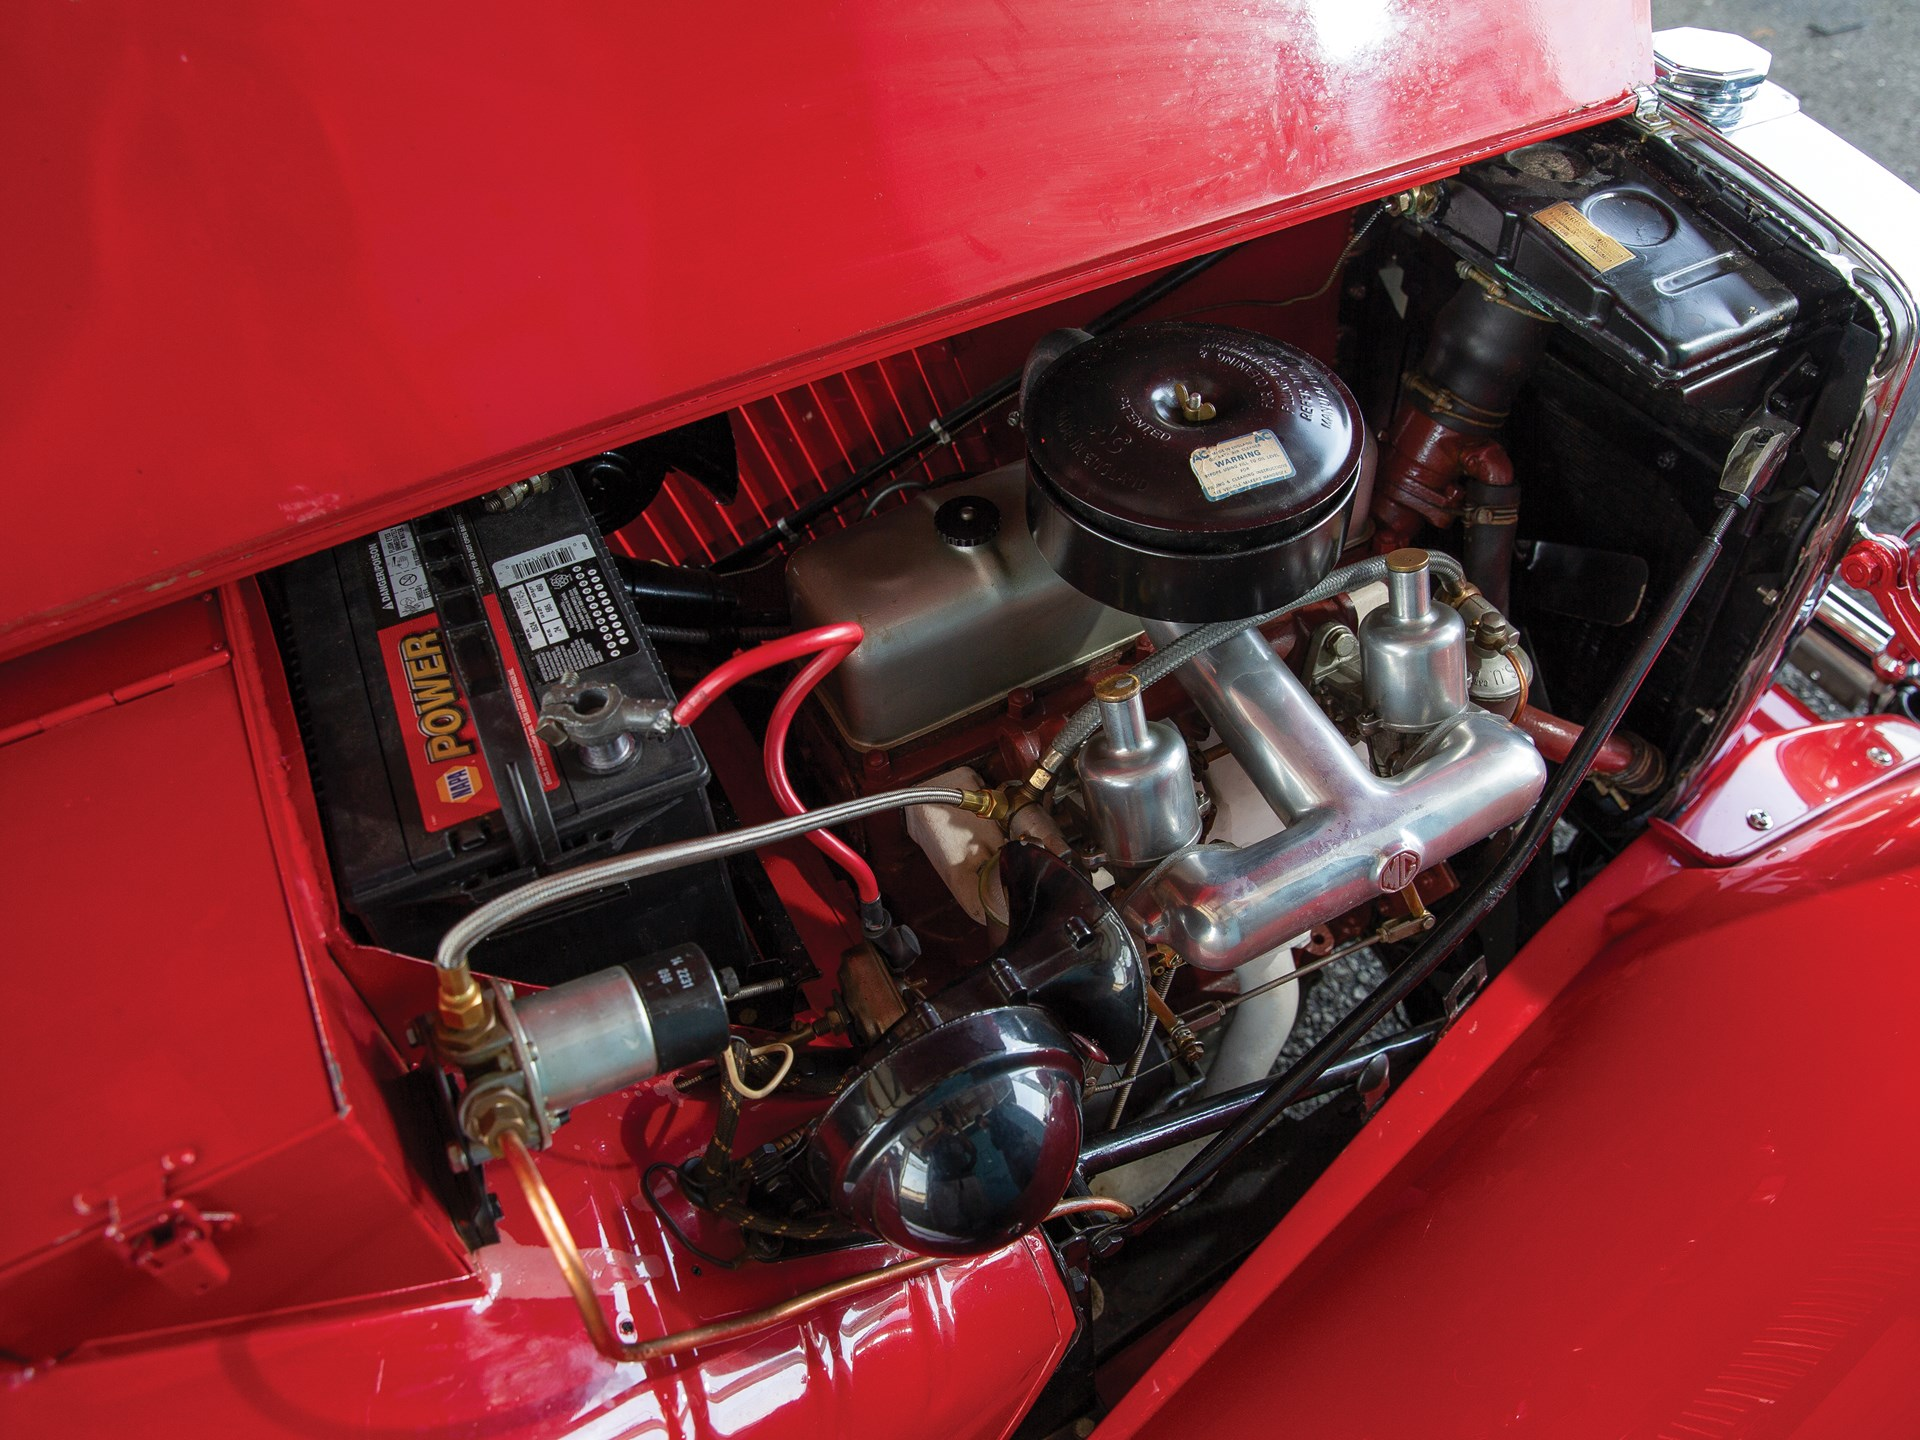 1952 MG TD engine intake carb